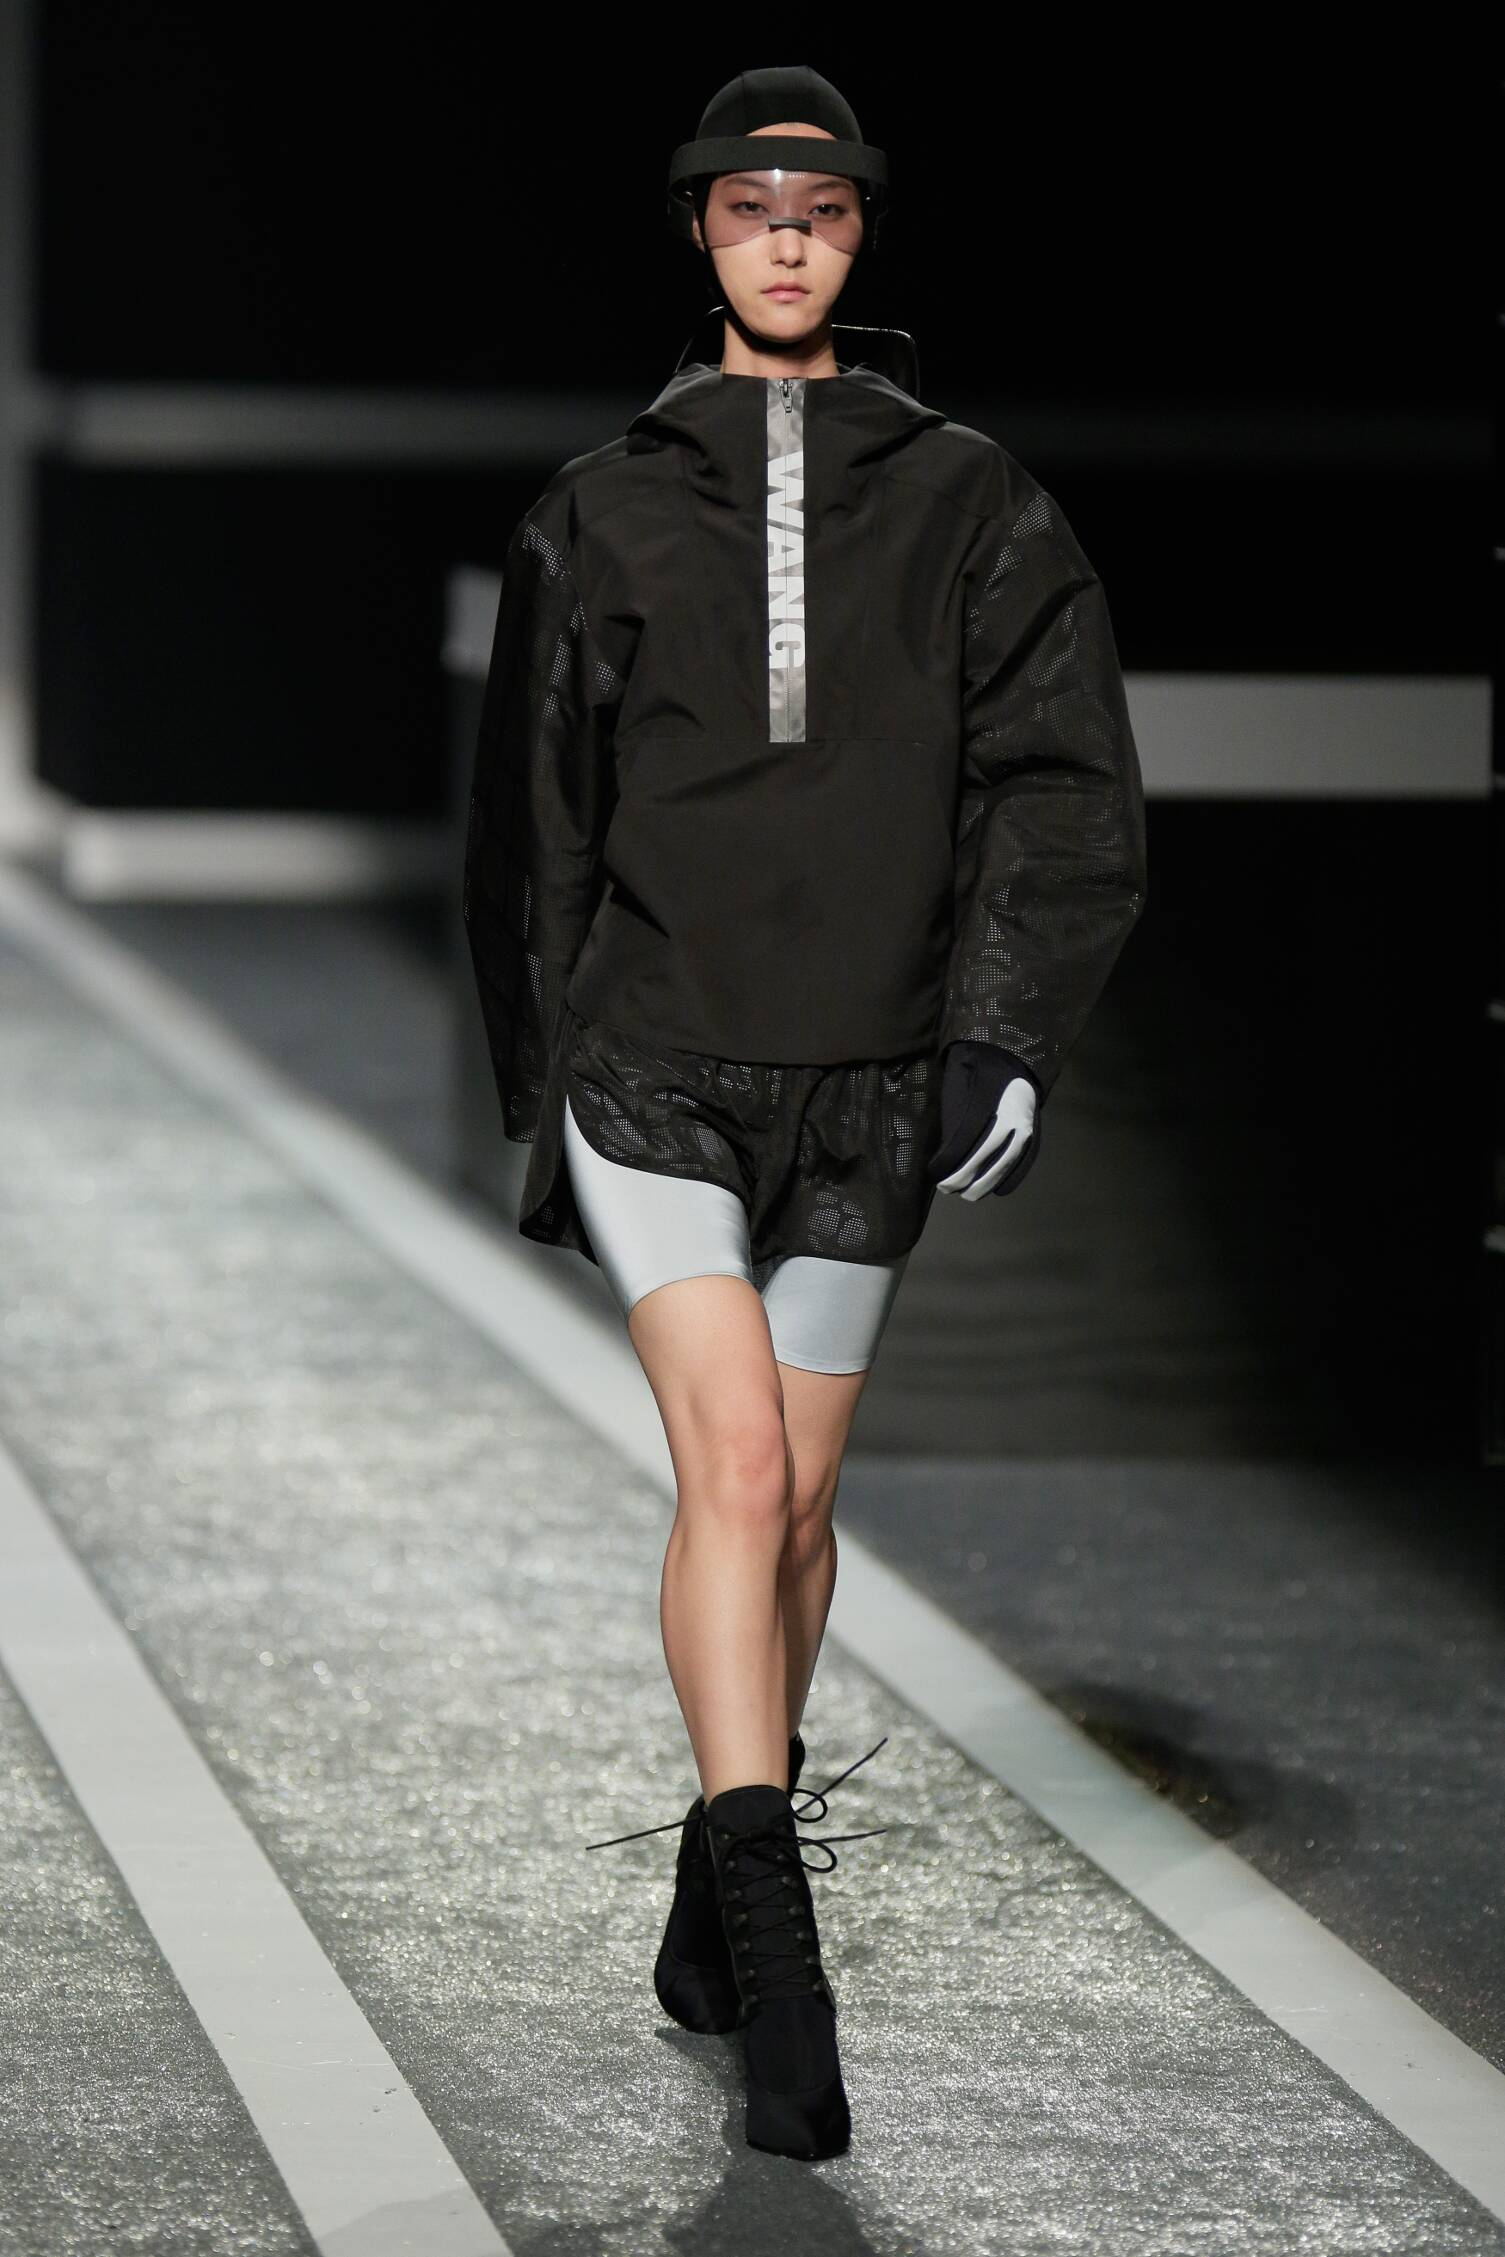 Alexander Wang for H&M Fashion 2015 Runway Model